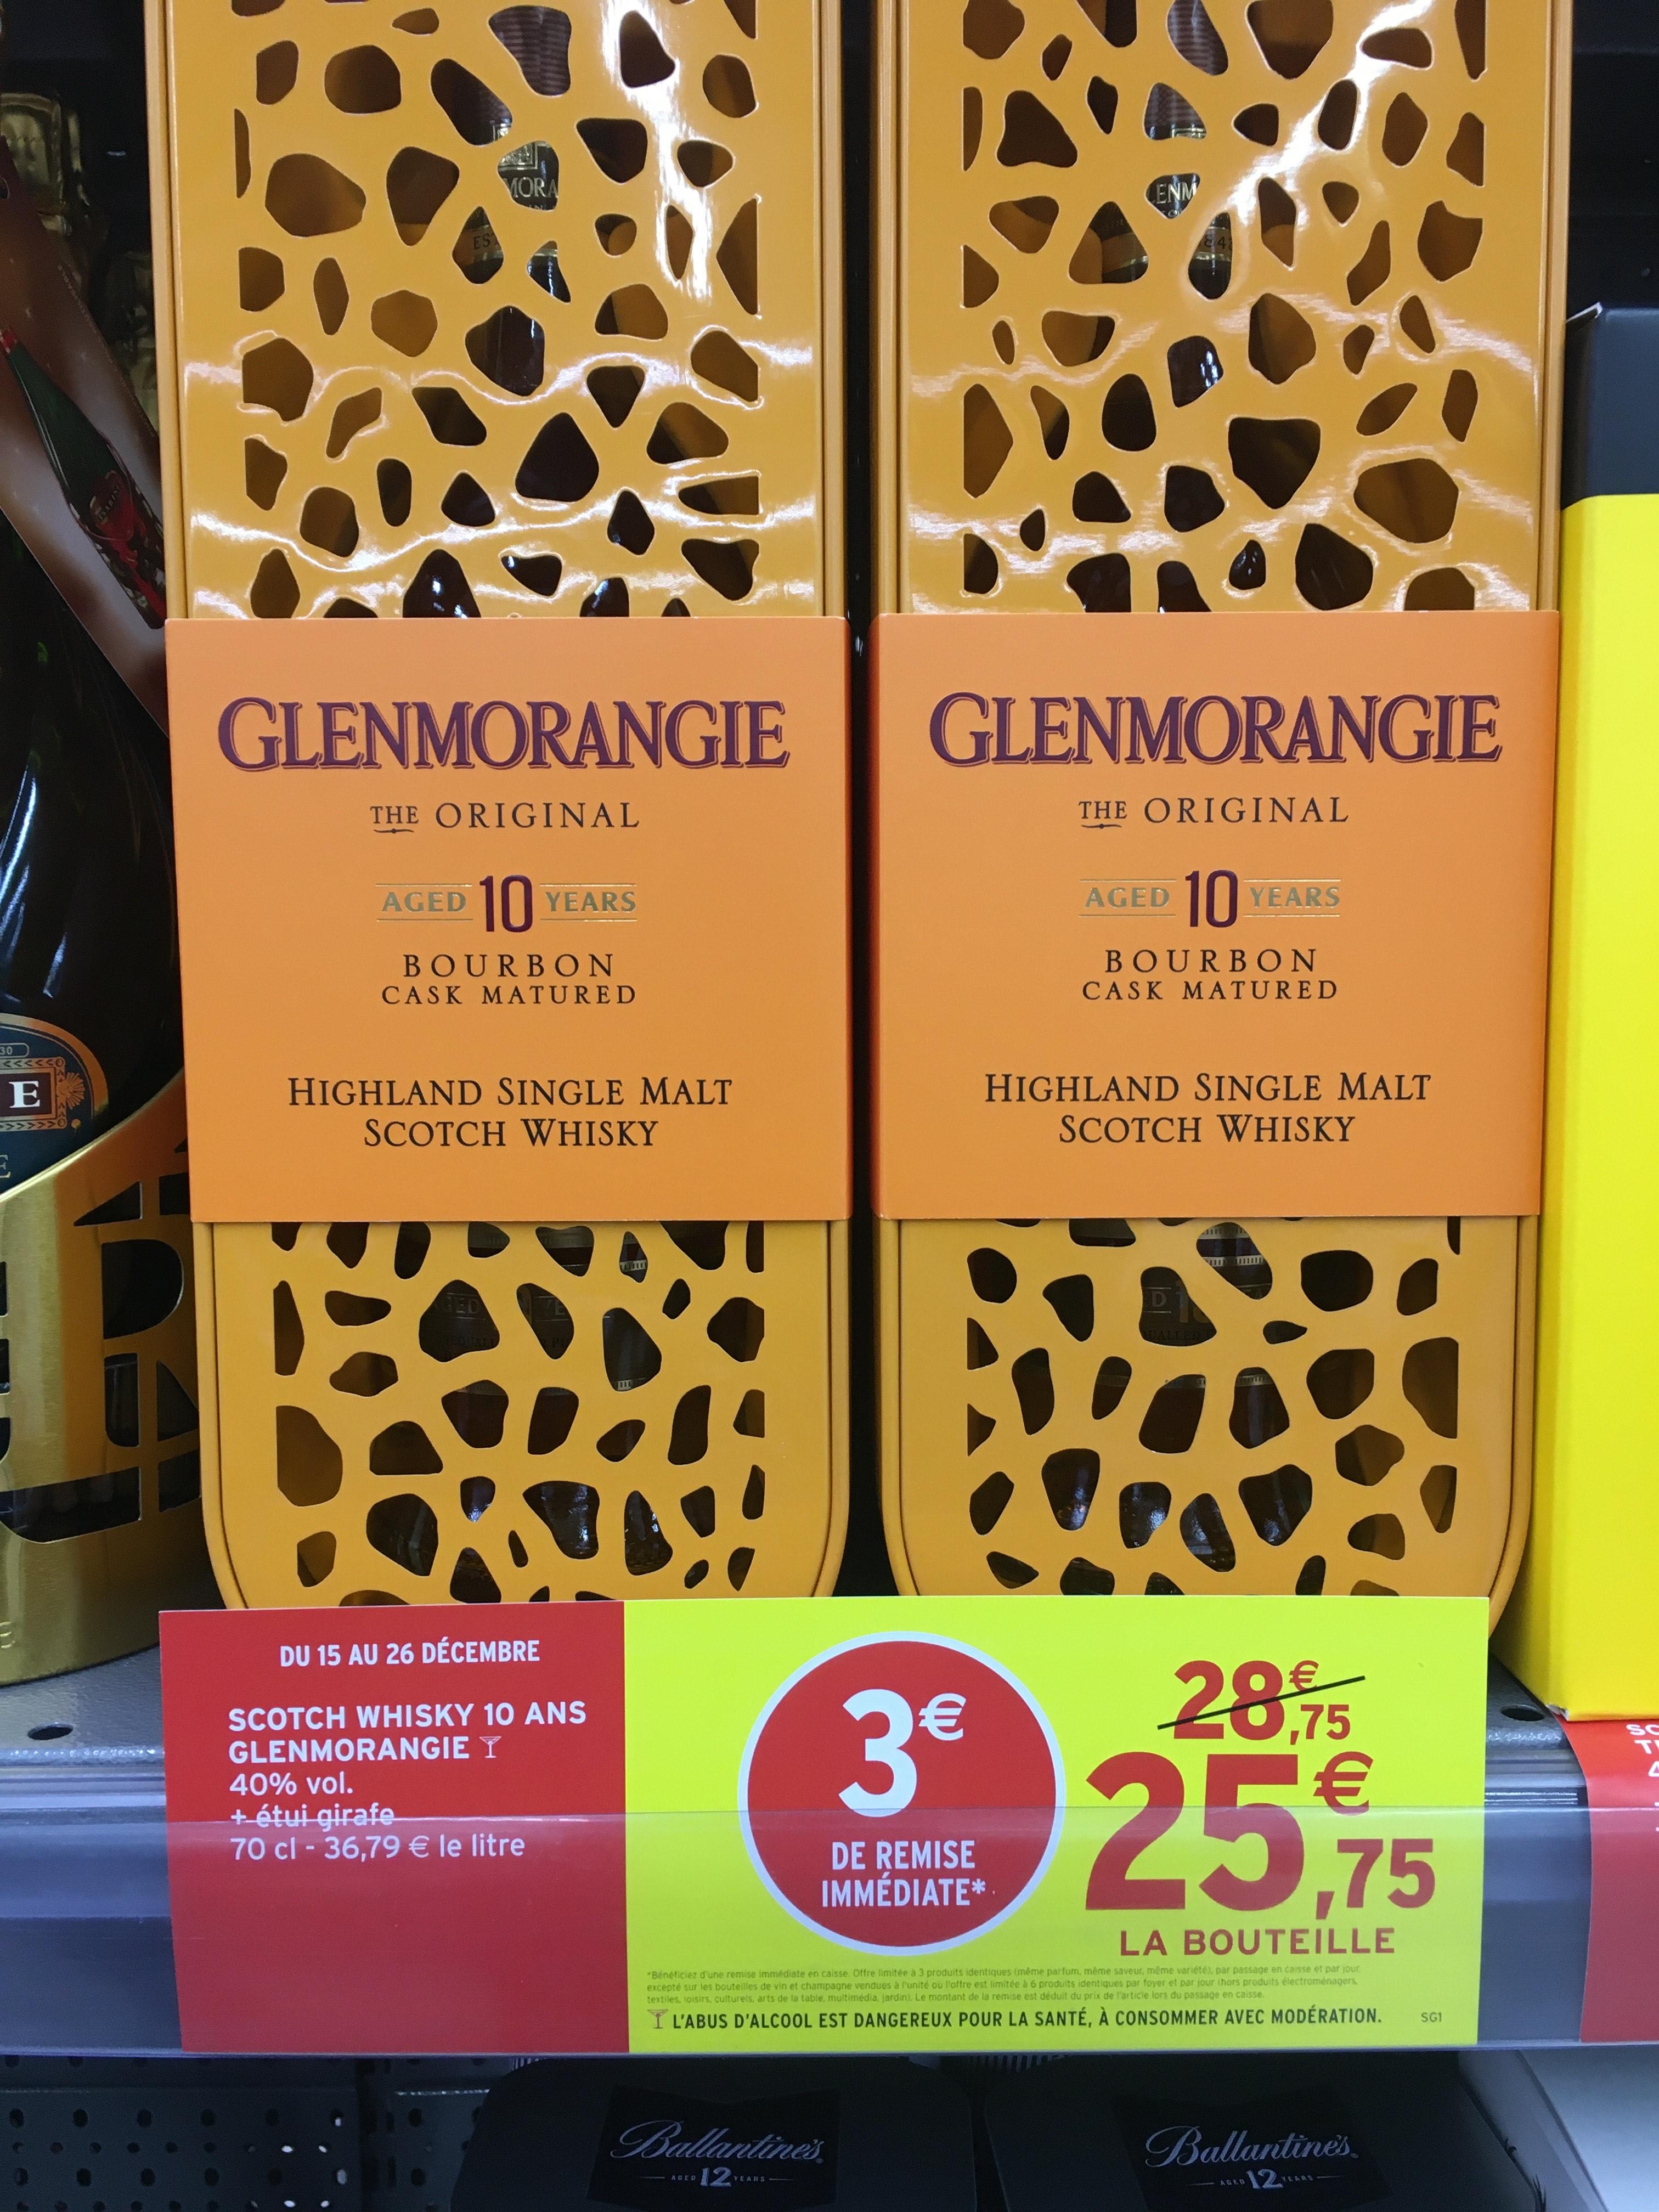 Bouteille de whisky Glenmorangie - Intermarché Champhol (28)